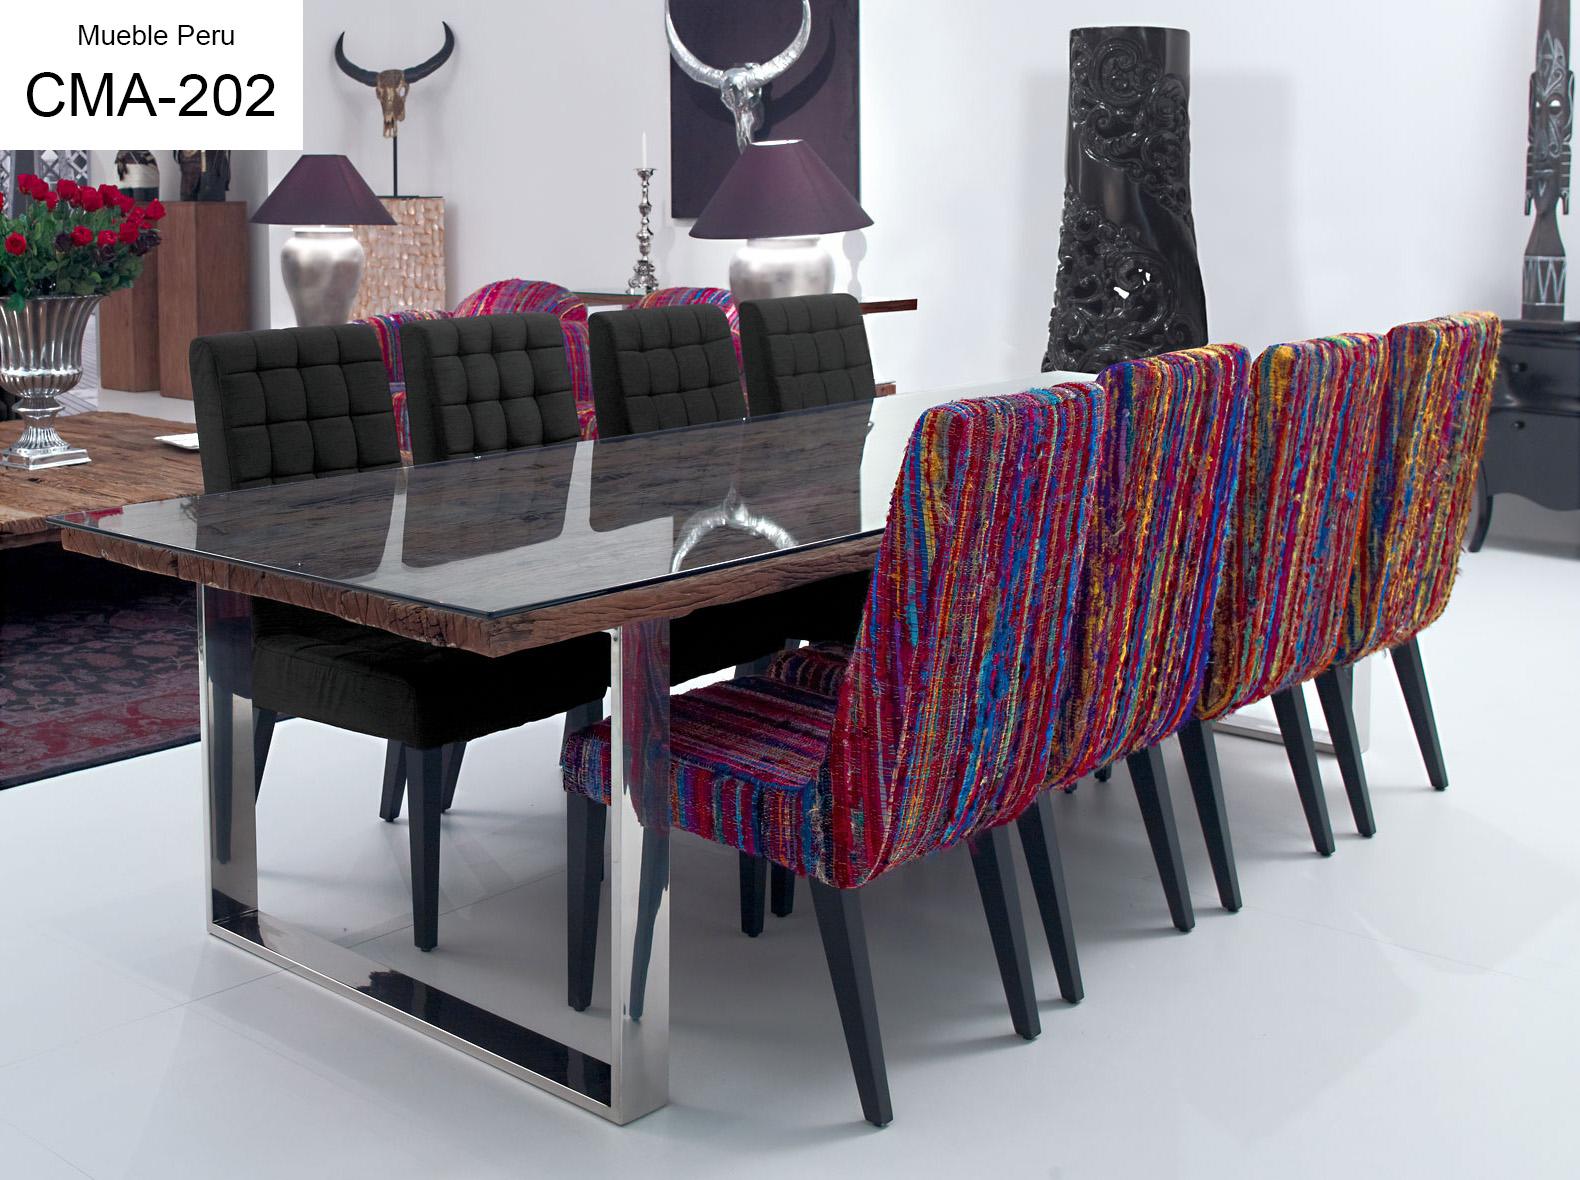 Comedores muebles per modernos juegos de comedor for Comedores modernos 2016 precios